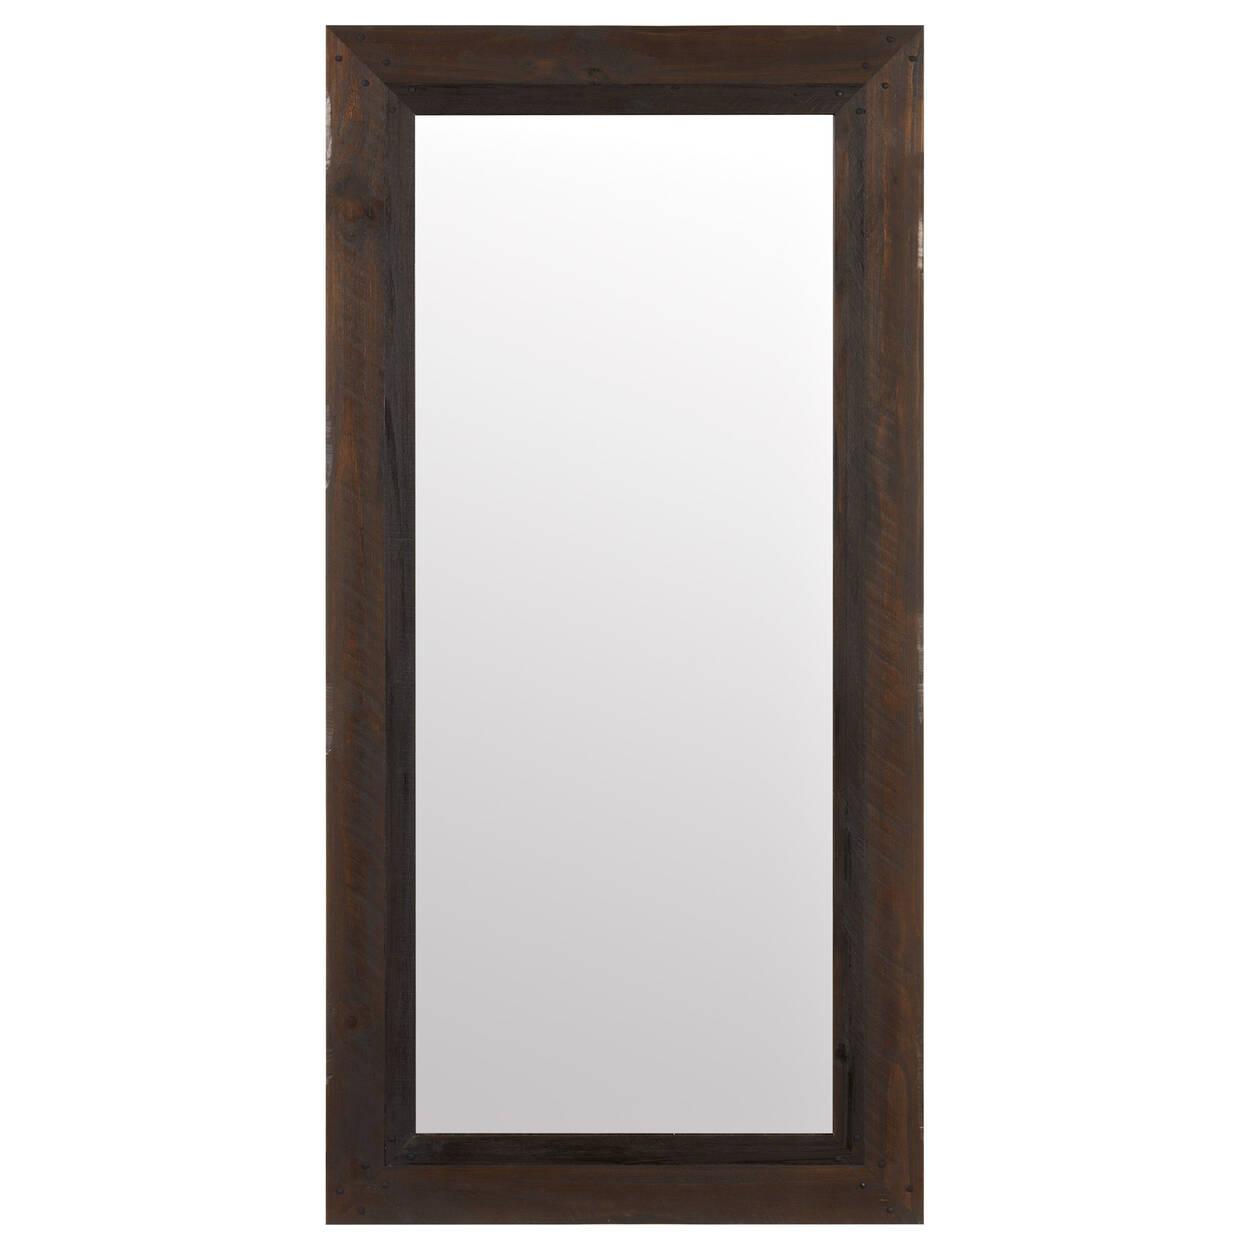 Miroir avec cadre effet bois de grange for Miroir mural en bois